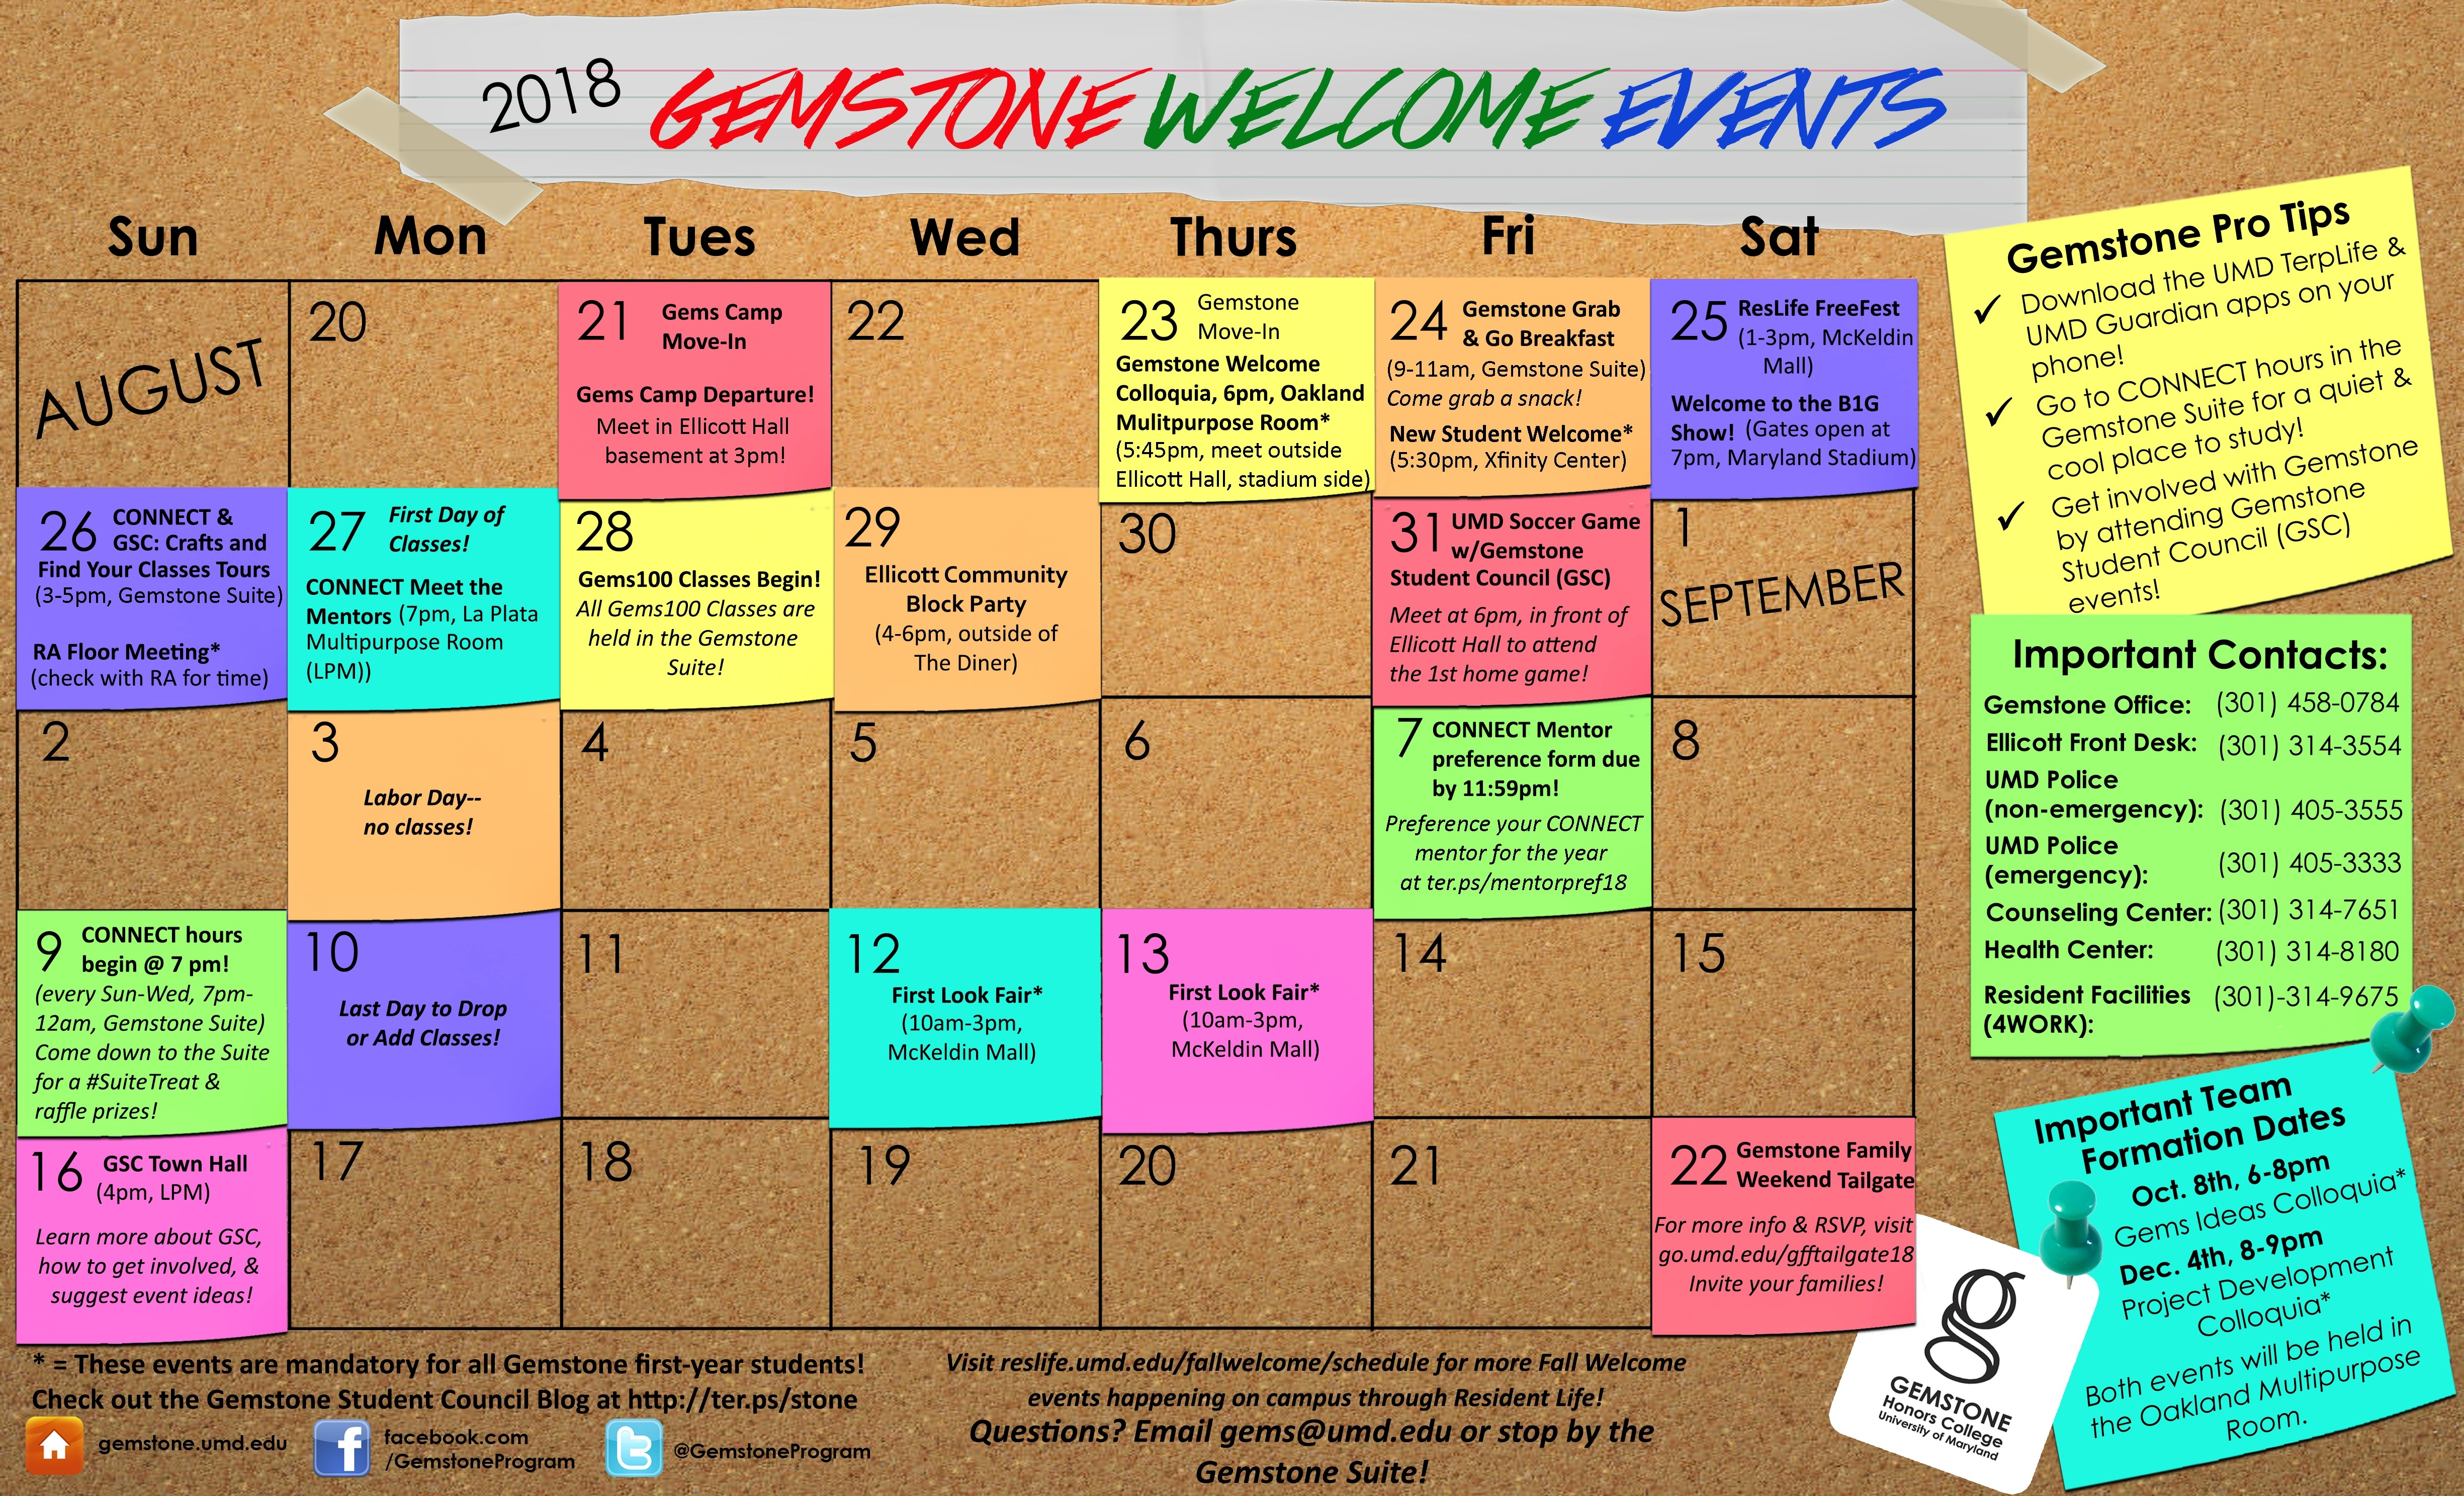 Ampp2018 2019 16 Umd Academic Calendar 2018 | Nicegalleries Calendar 2019 Umd